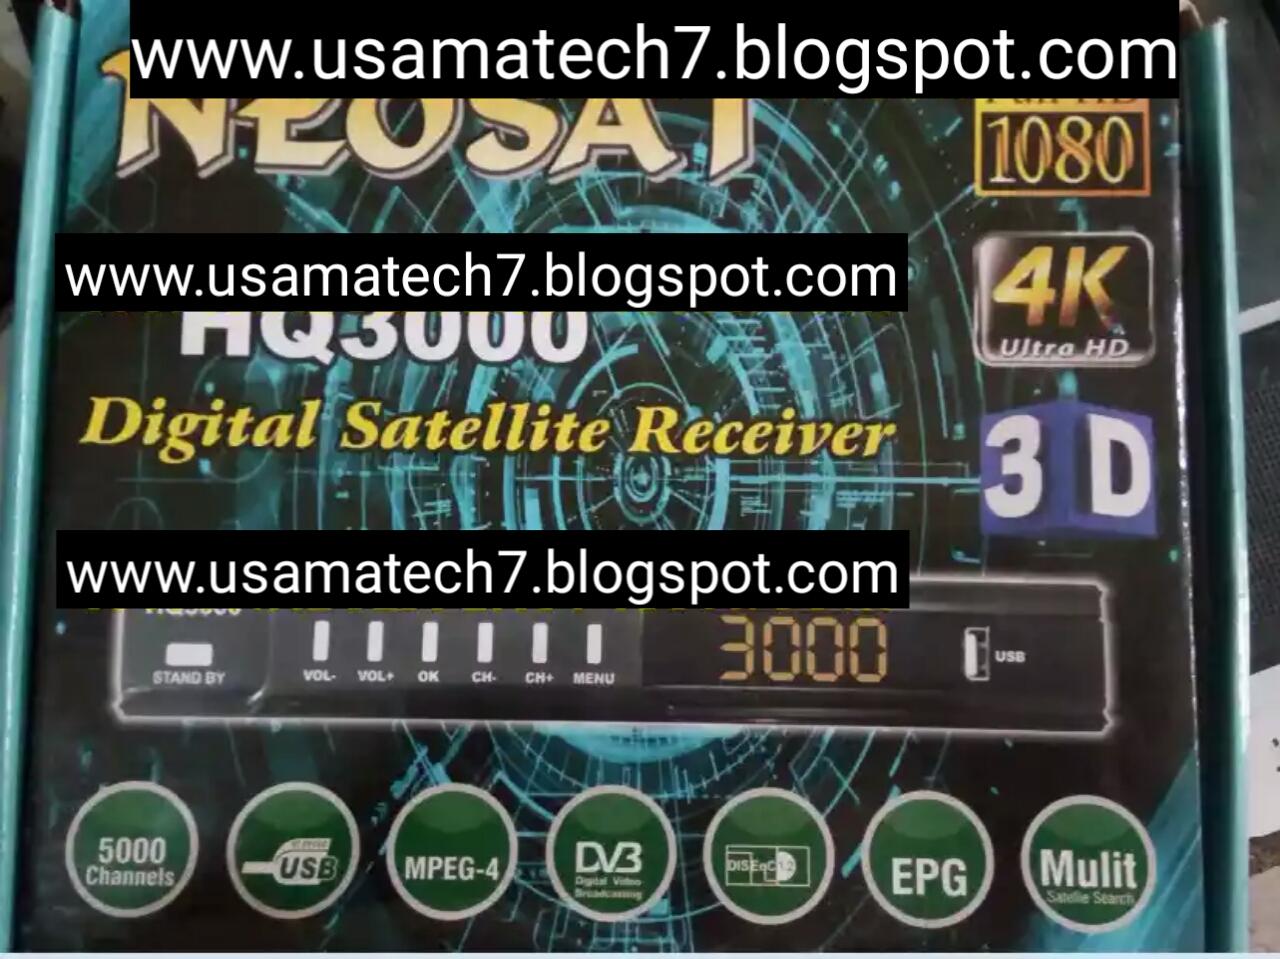 NEOSAT HQ3000 HD RECEIVER AUTO ROLL POWERVU KEY NEW SOFTWARE